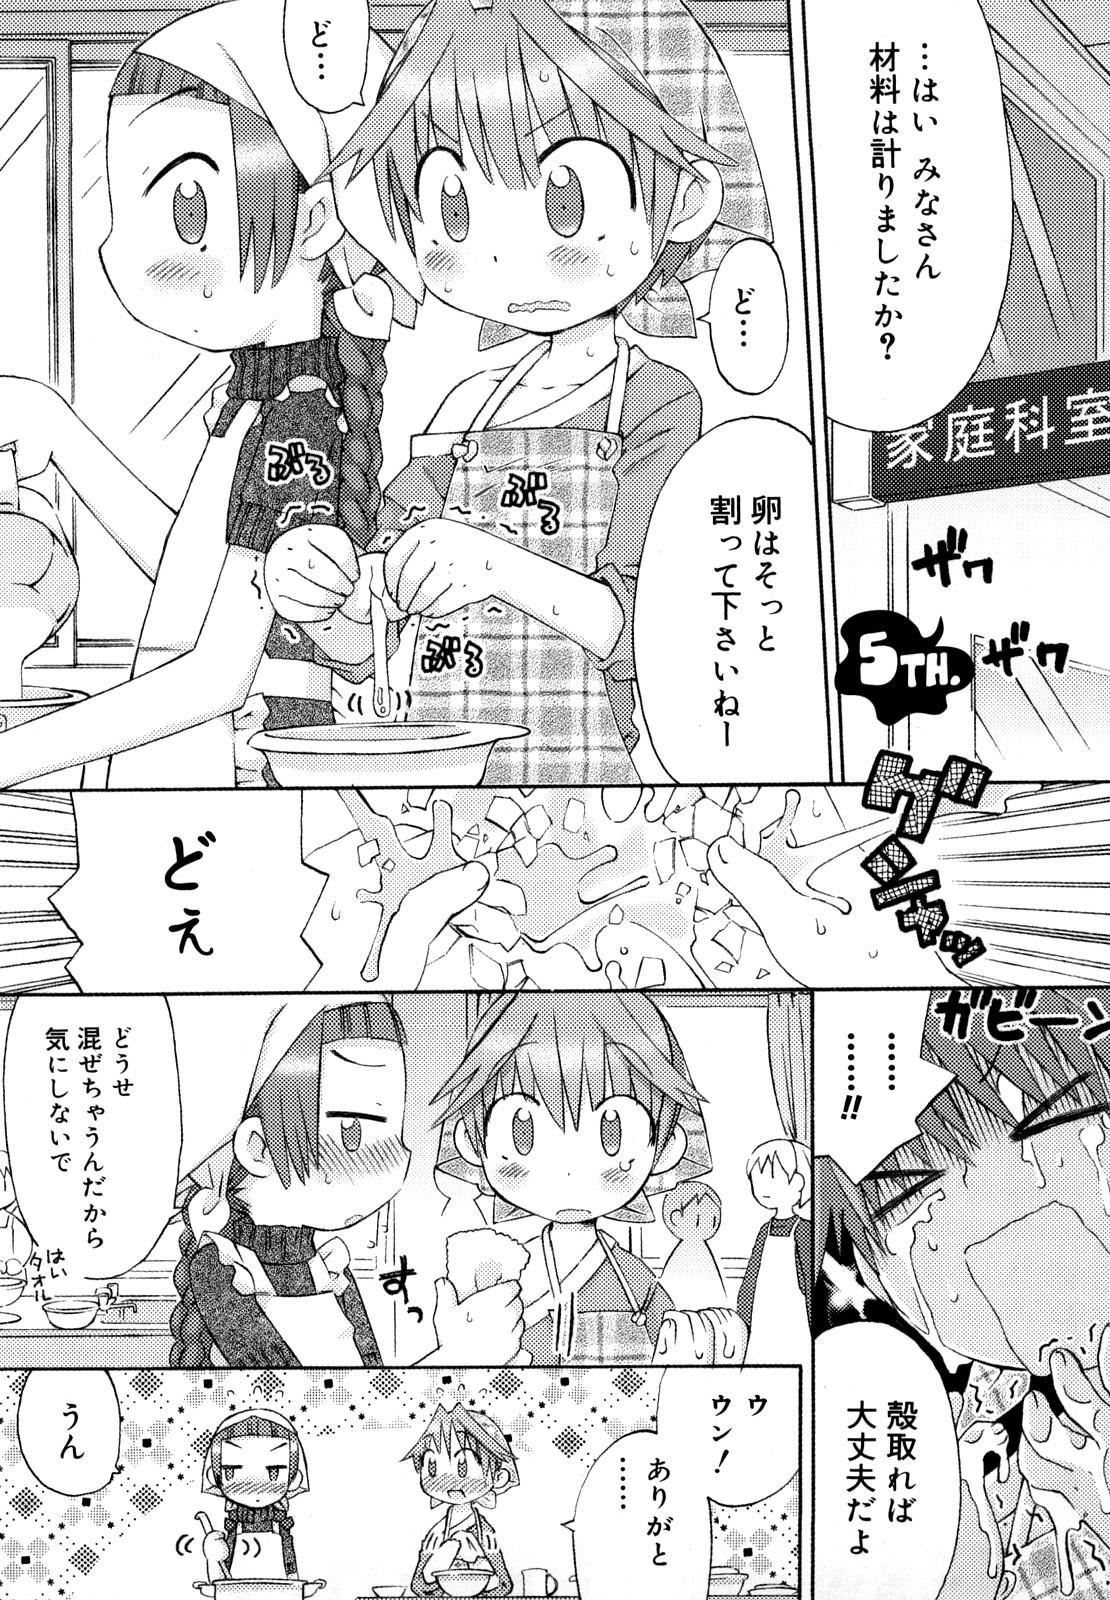 Hatsuden Pandakun! Shinsouban 89